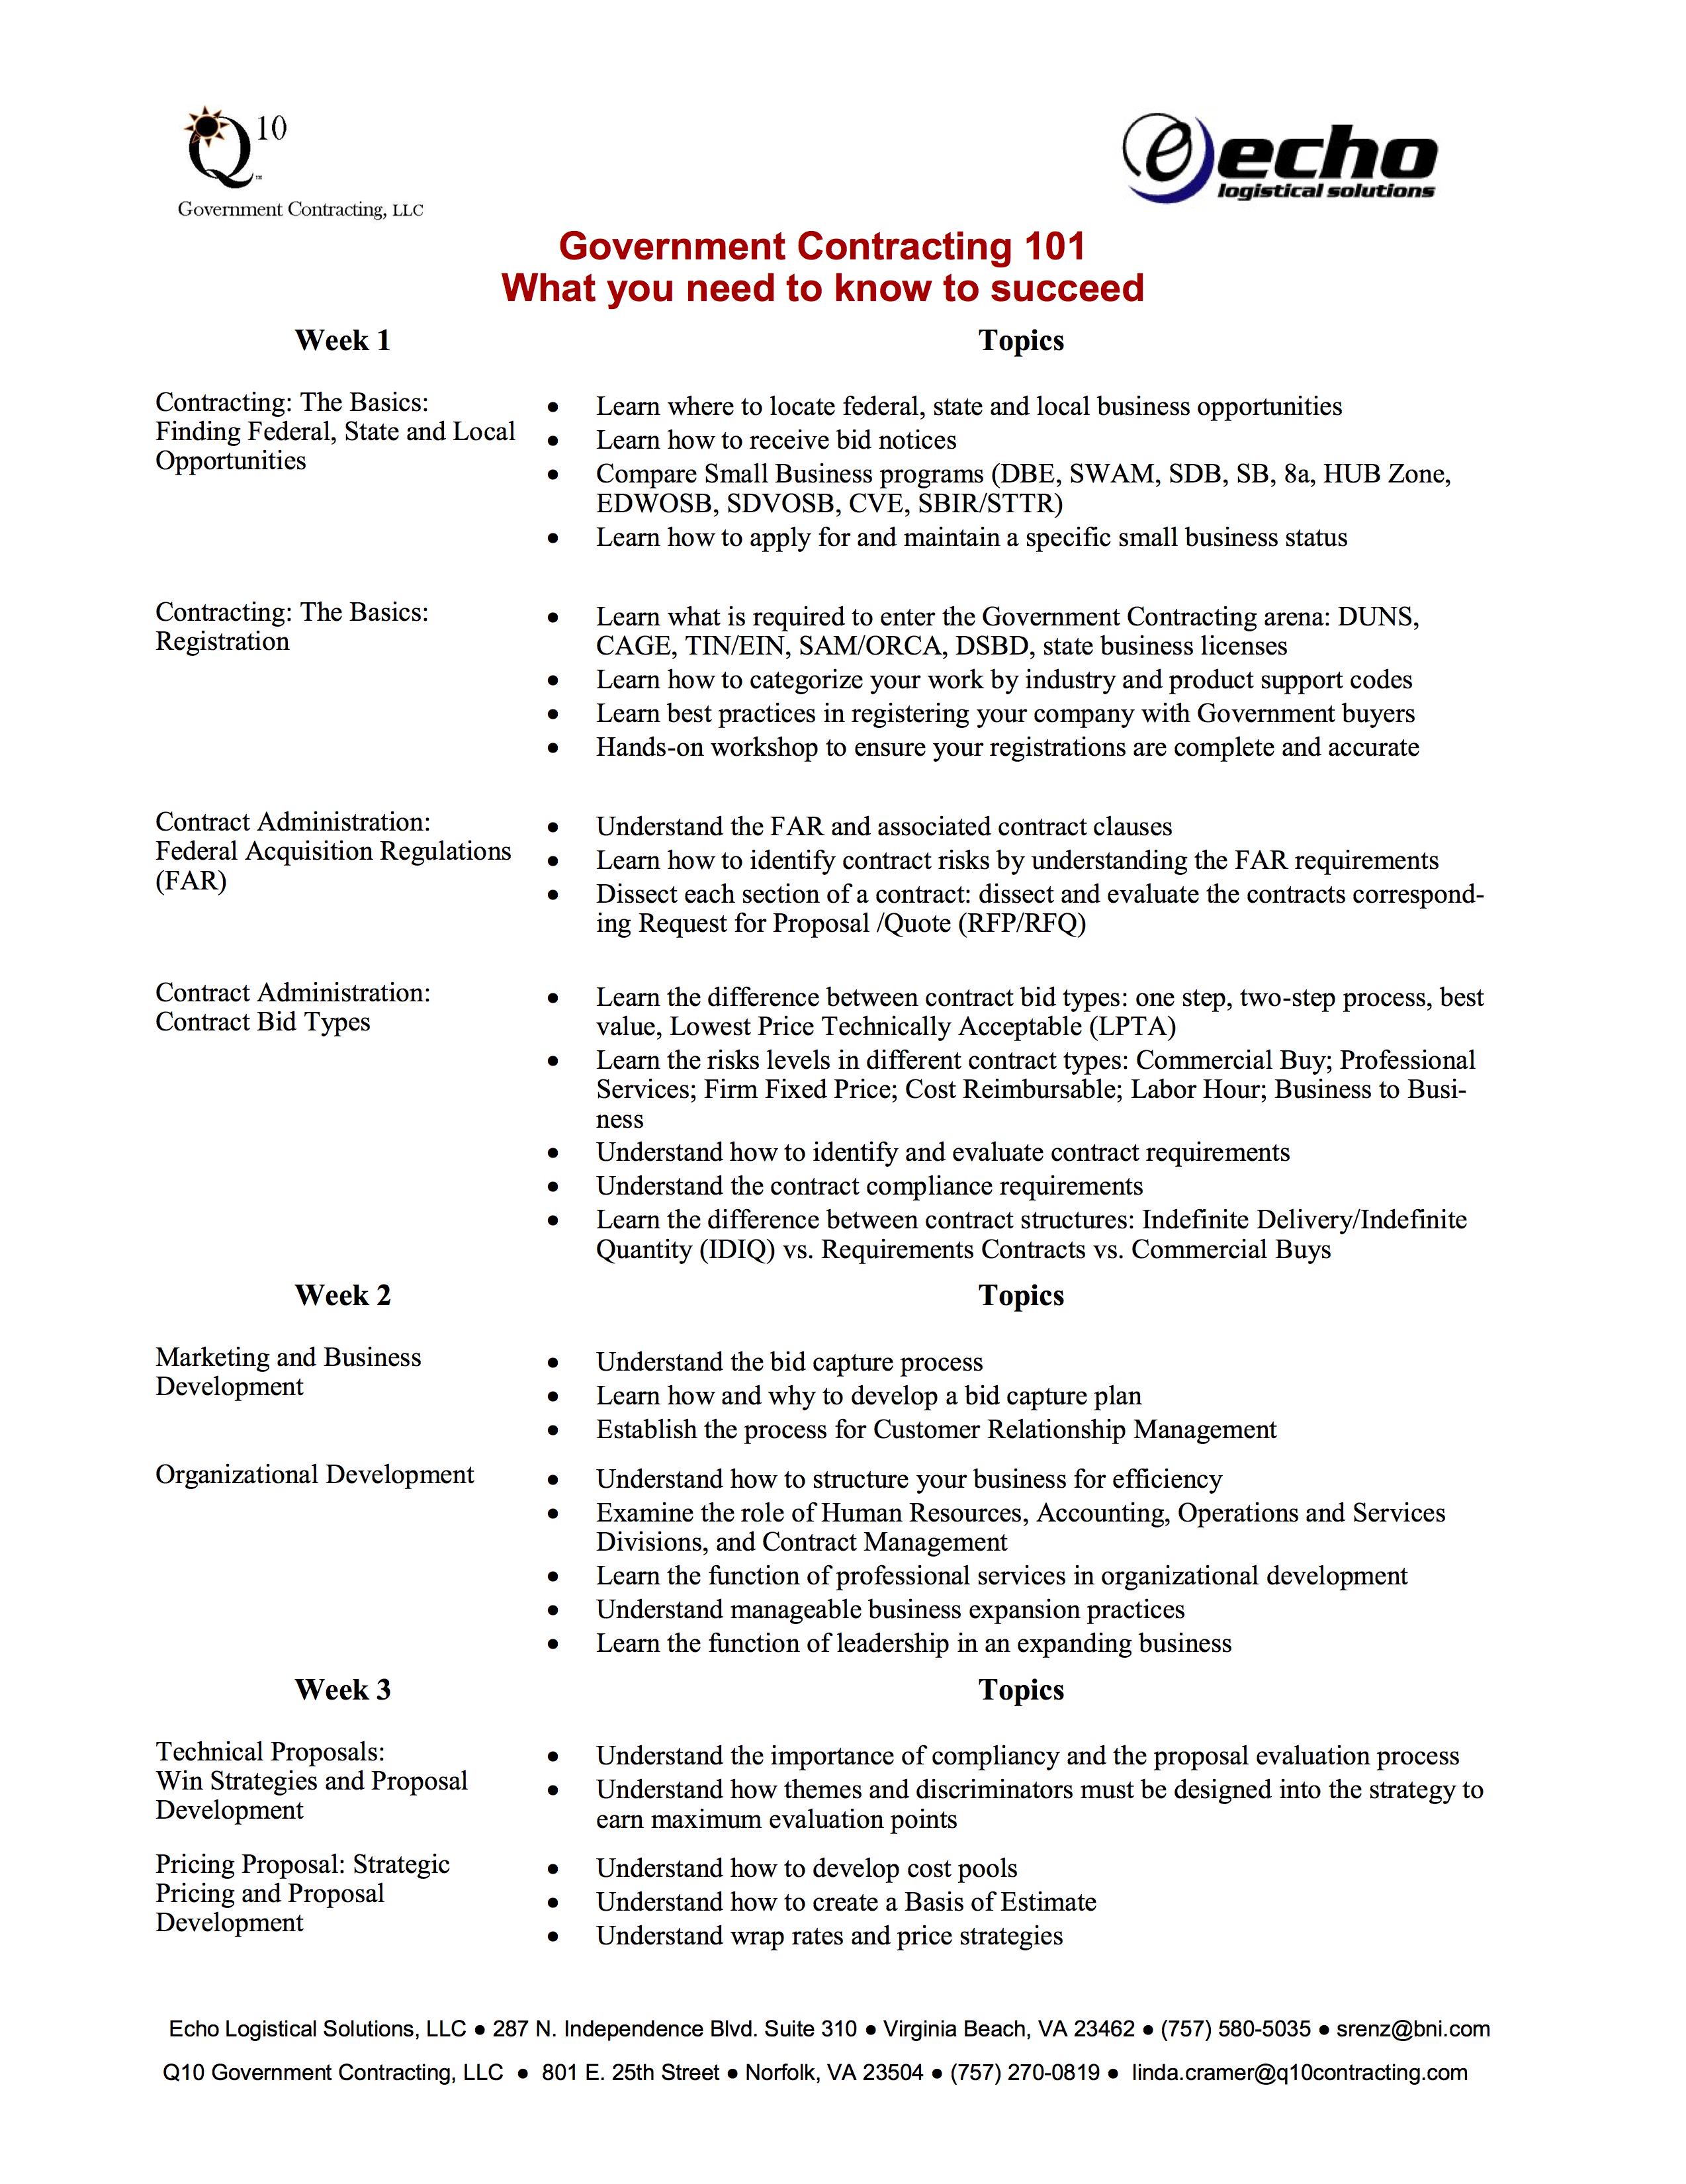 Government Contracting 101 Q10 Government Contracting